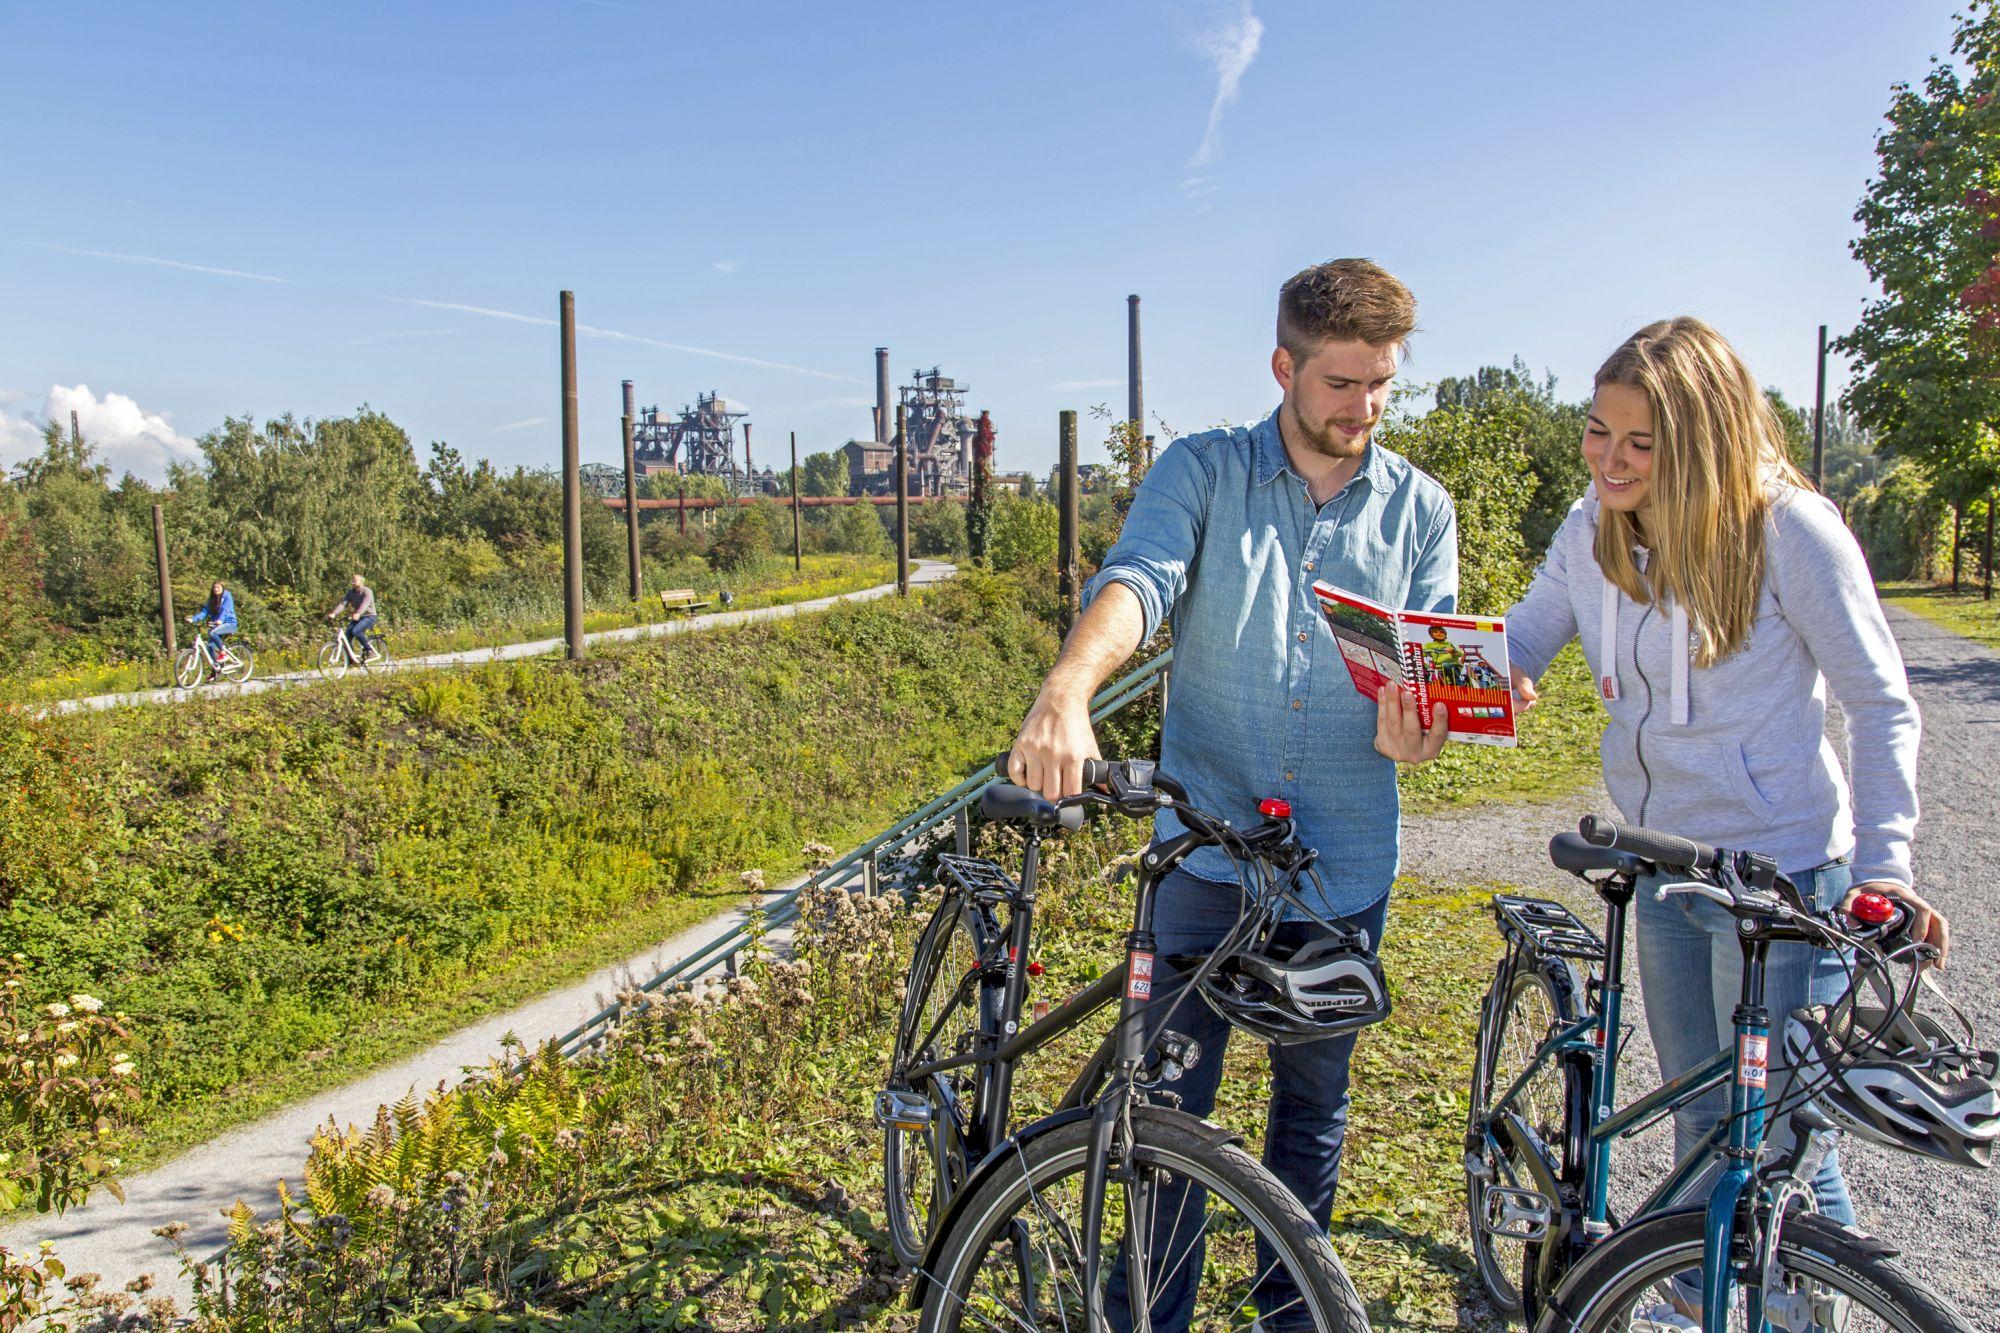 Rowerem w Duisburgu